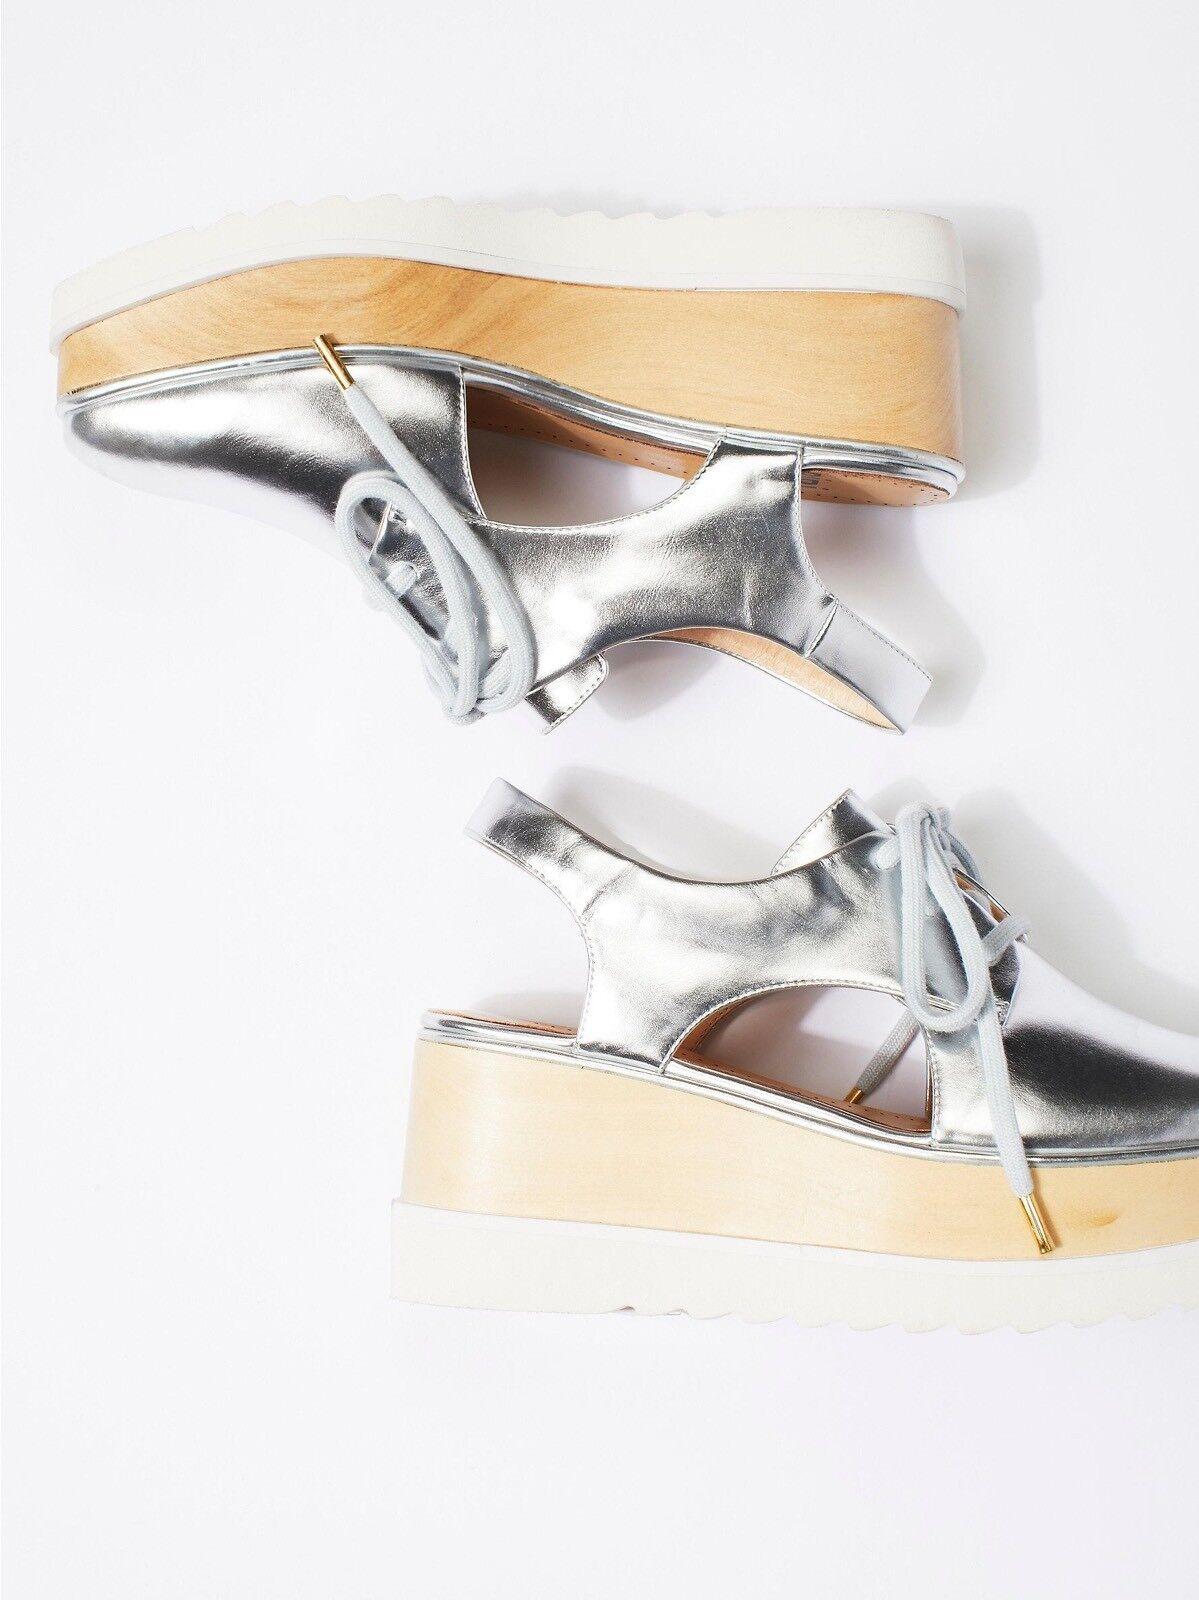 Bibi Loui X Free People Damenschuhe Madison Platform Wedge Schuhes Silver Sz 39 New